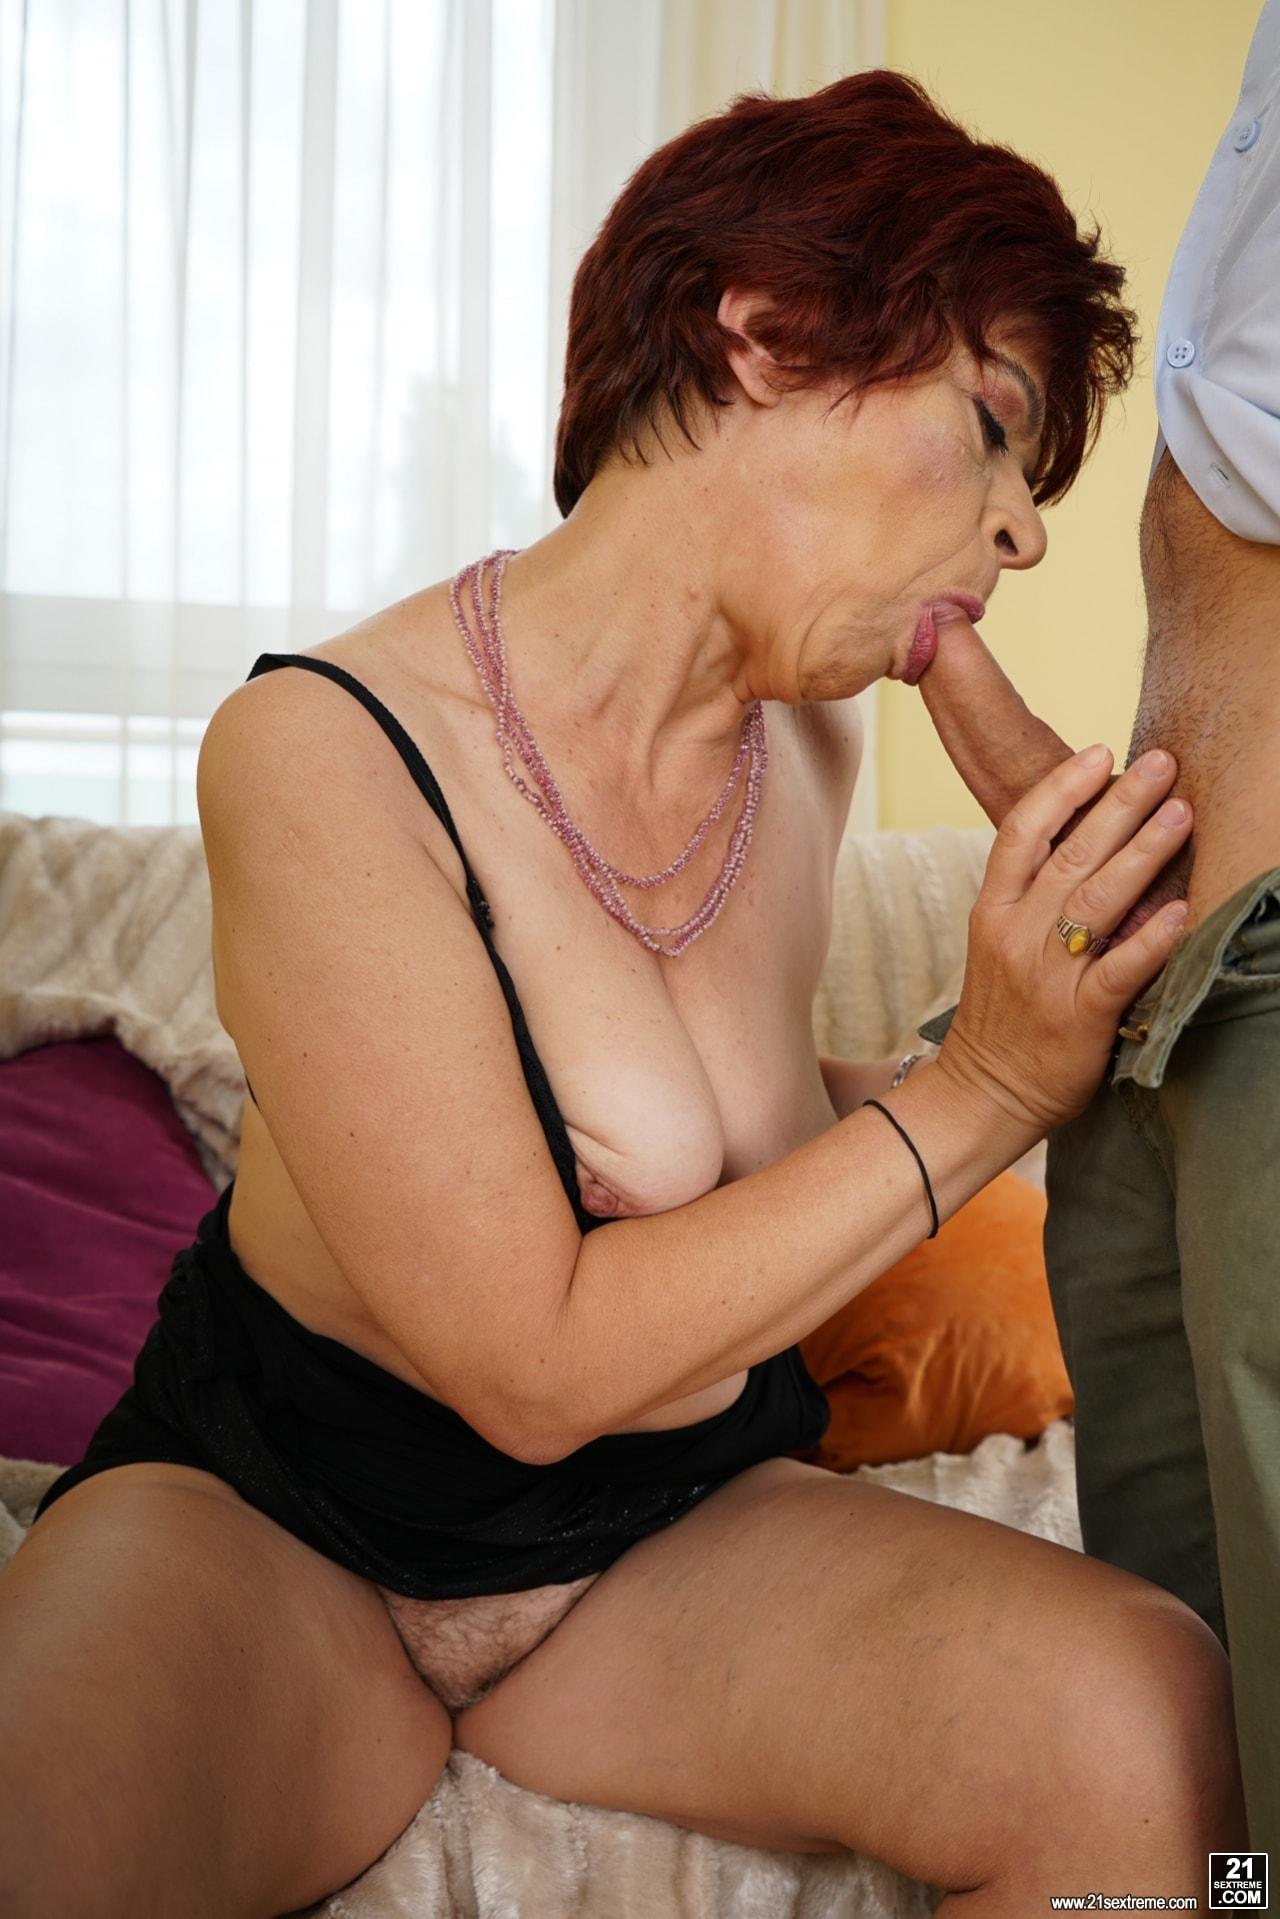 21Sextury 'A Taste of Experience' starring Donatella (Photo 133)